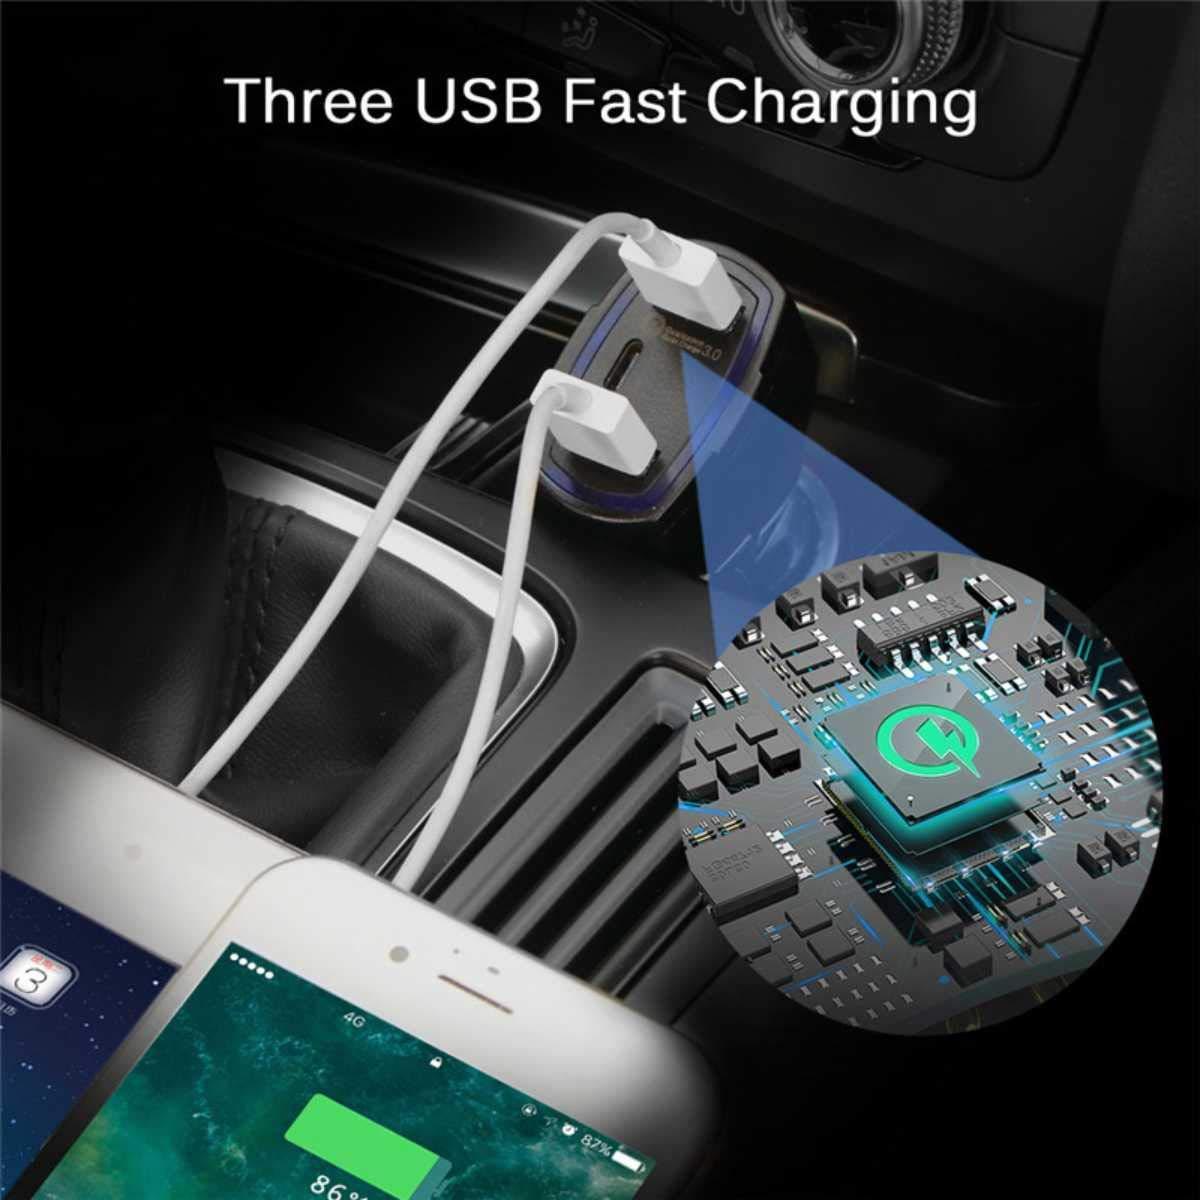 ULTRICS/® Cargador de Coche iPad iPhone X//8 Plus Universal Movil Rapida para Android Samsung S9//S8 Plus 36W 3 Puertos USB Tipo C Qualcomm Quick Charge QC 3.0 Rapido Cargadore Adaptador